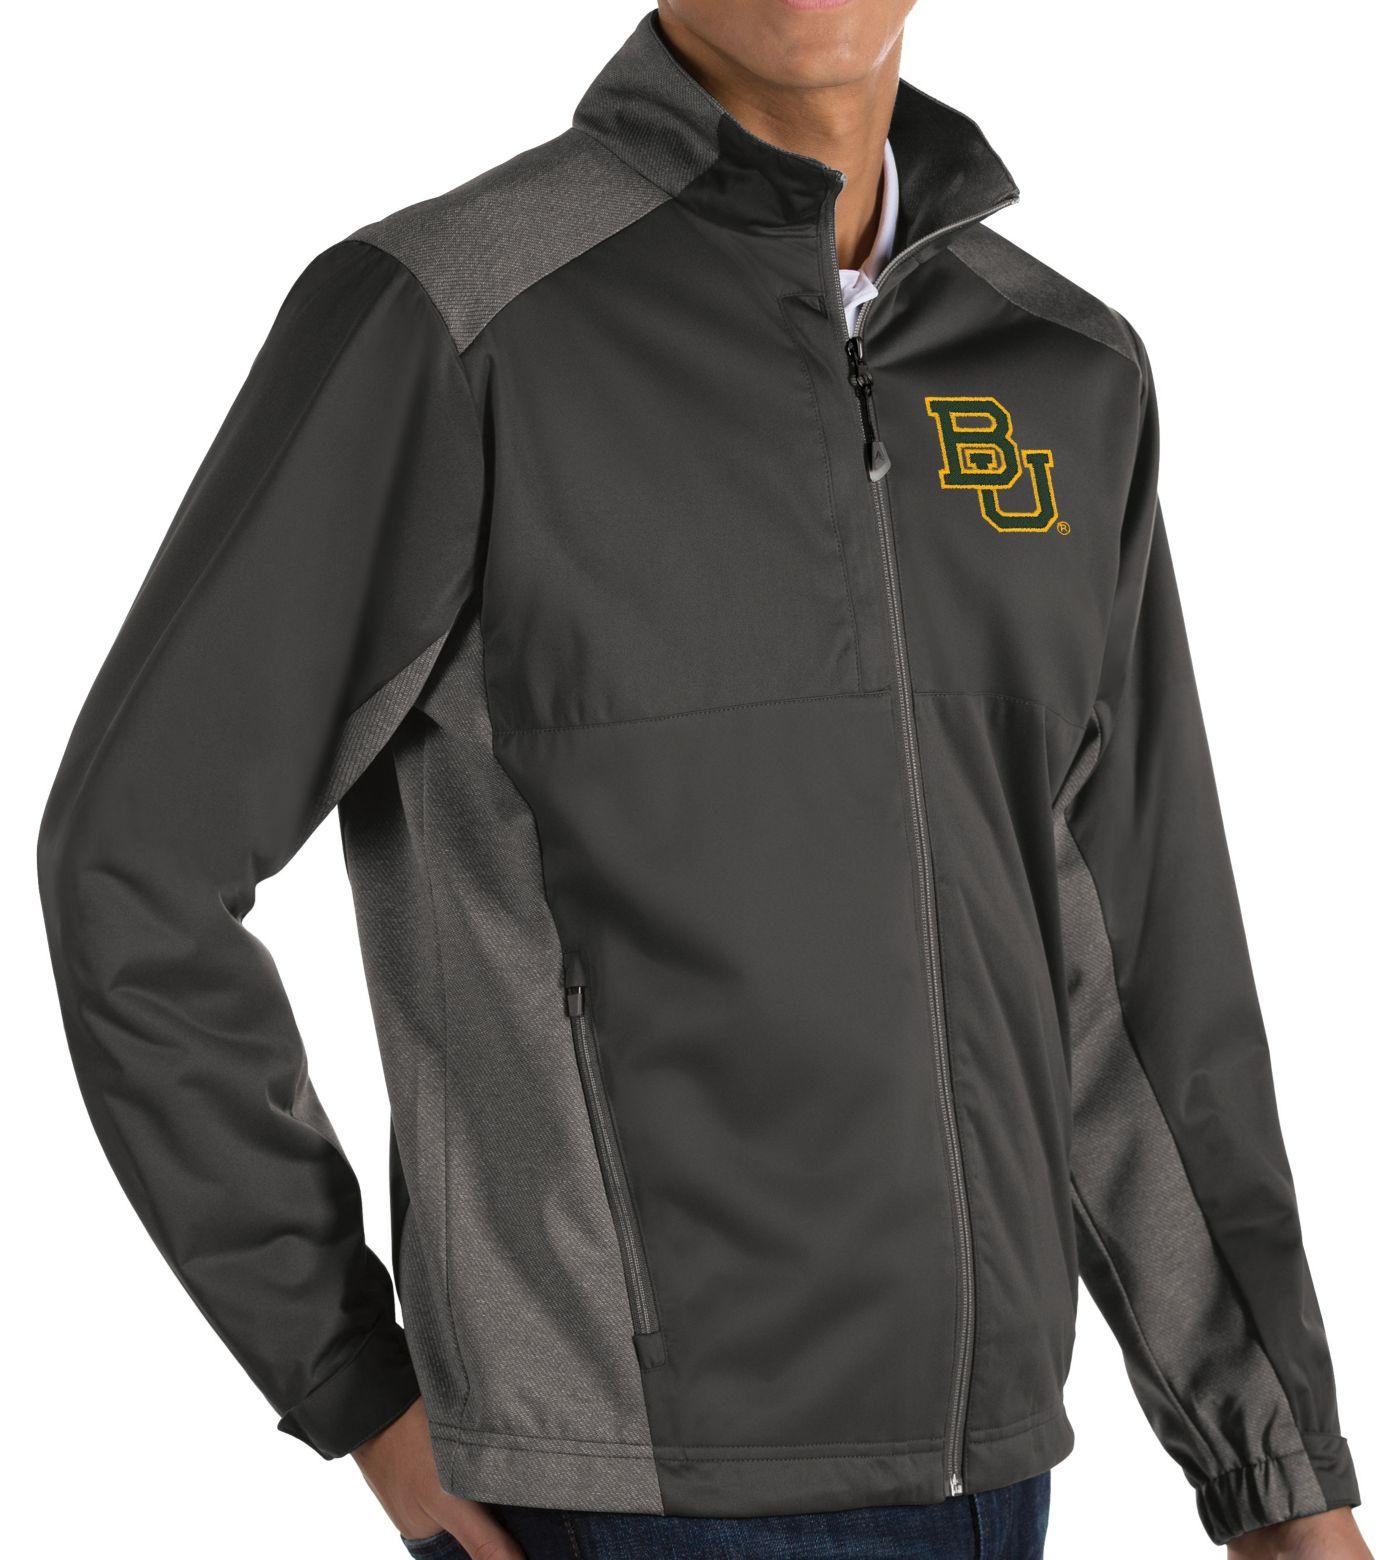 Antigua Men's Baylor Bears Grey Revolve Full-Zip Jacket